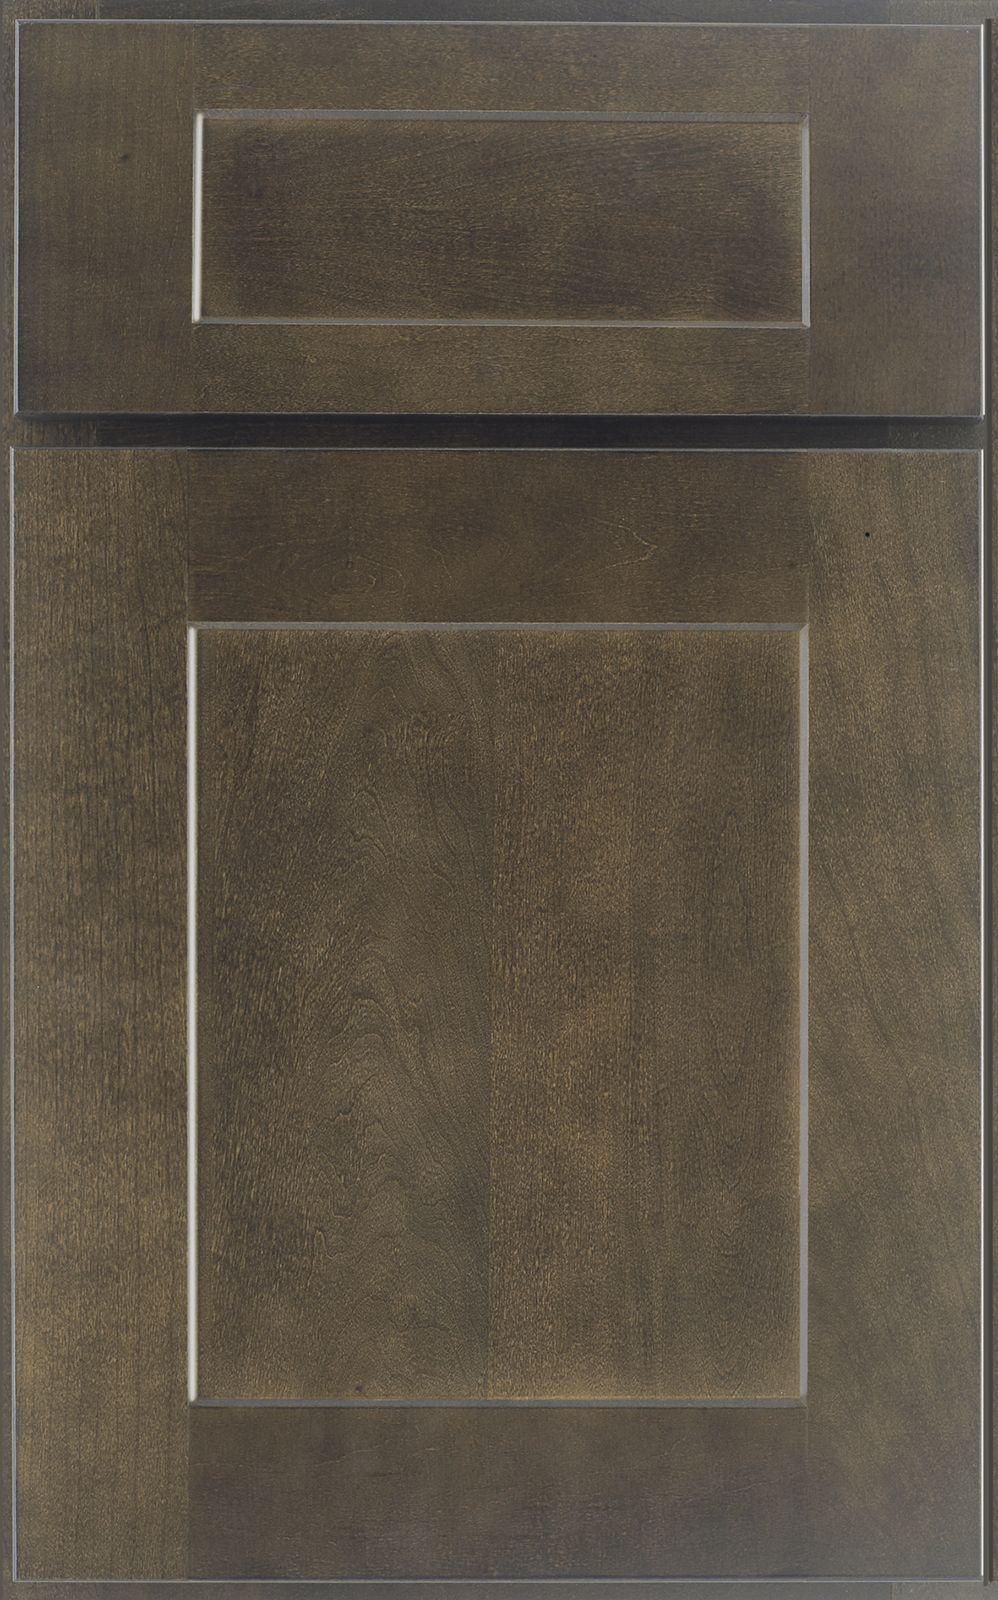 Echelon Ardmore Cabinet In 2020 Double Espresso Ardmore Cabinet